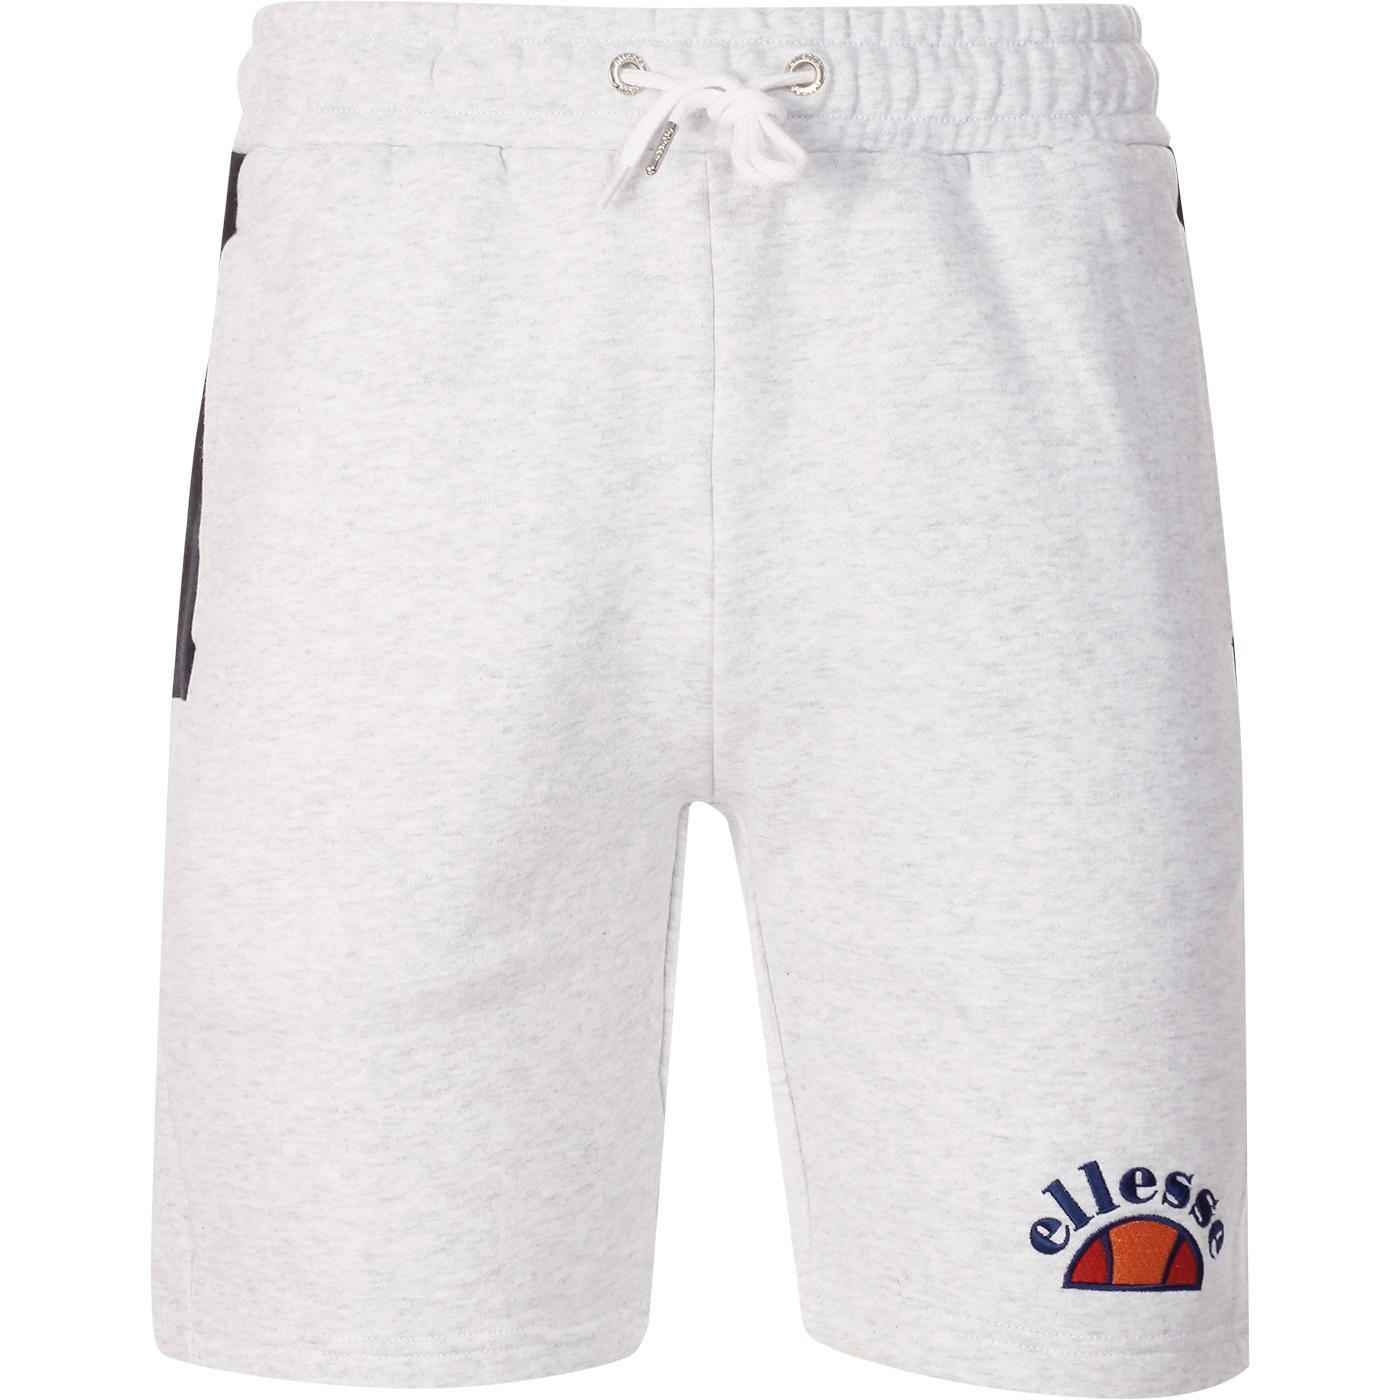 Alfonsi ELLESSE Men's Retro Fleece Shorts White